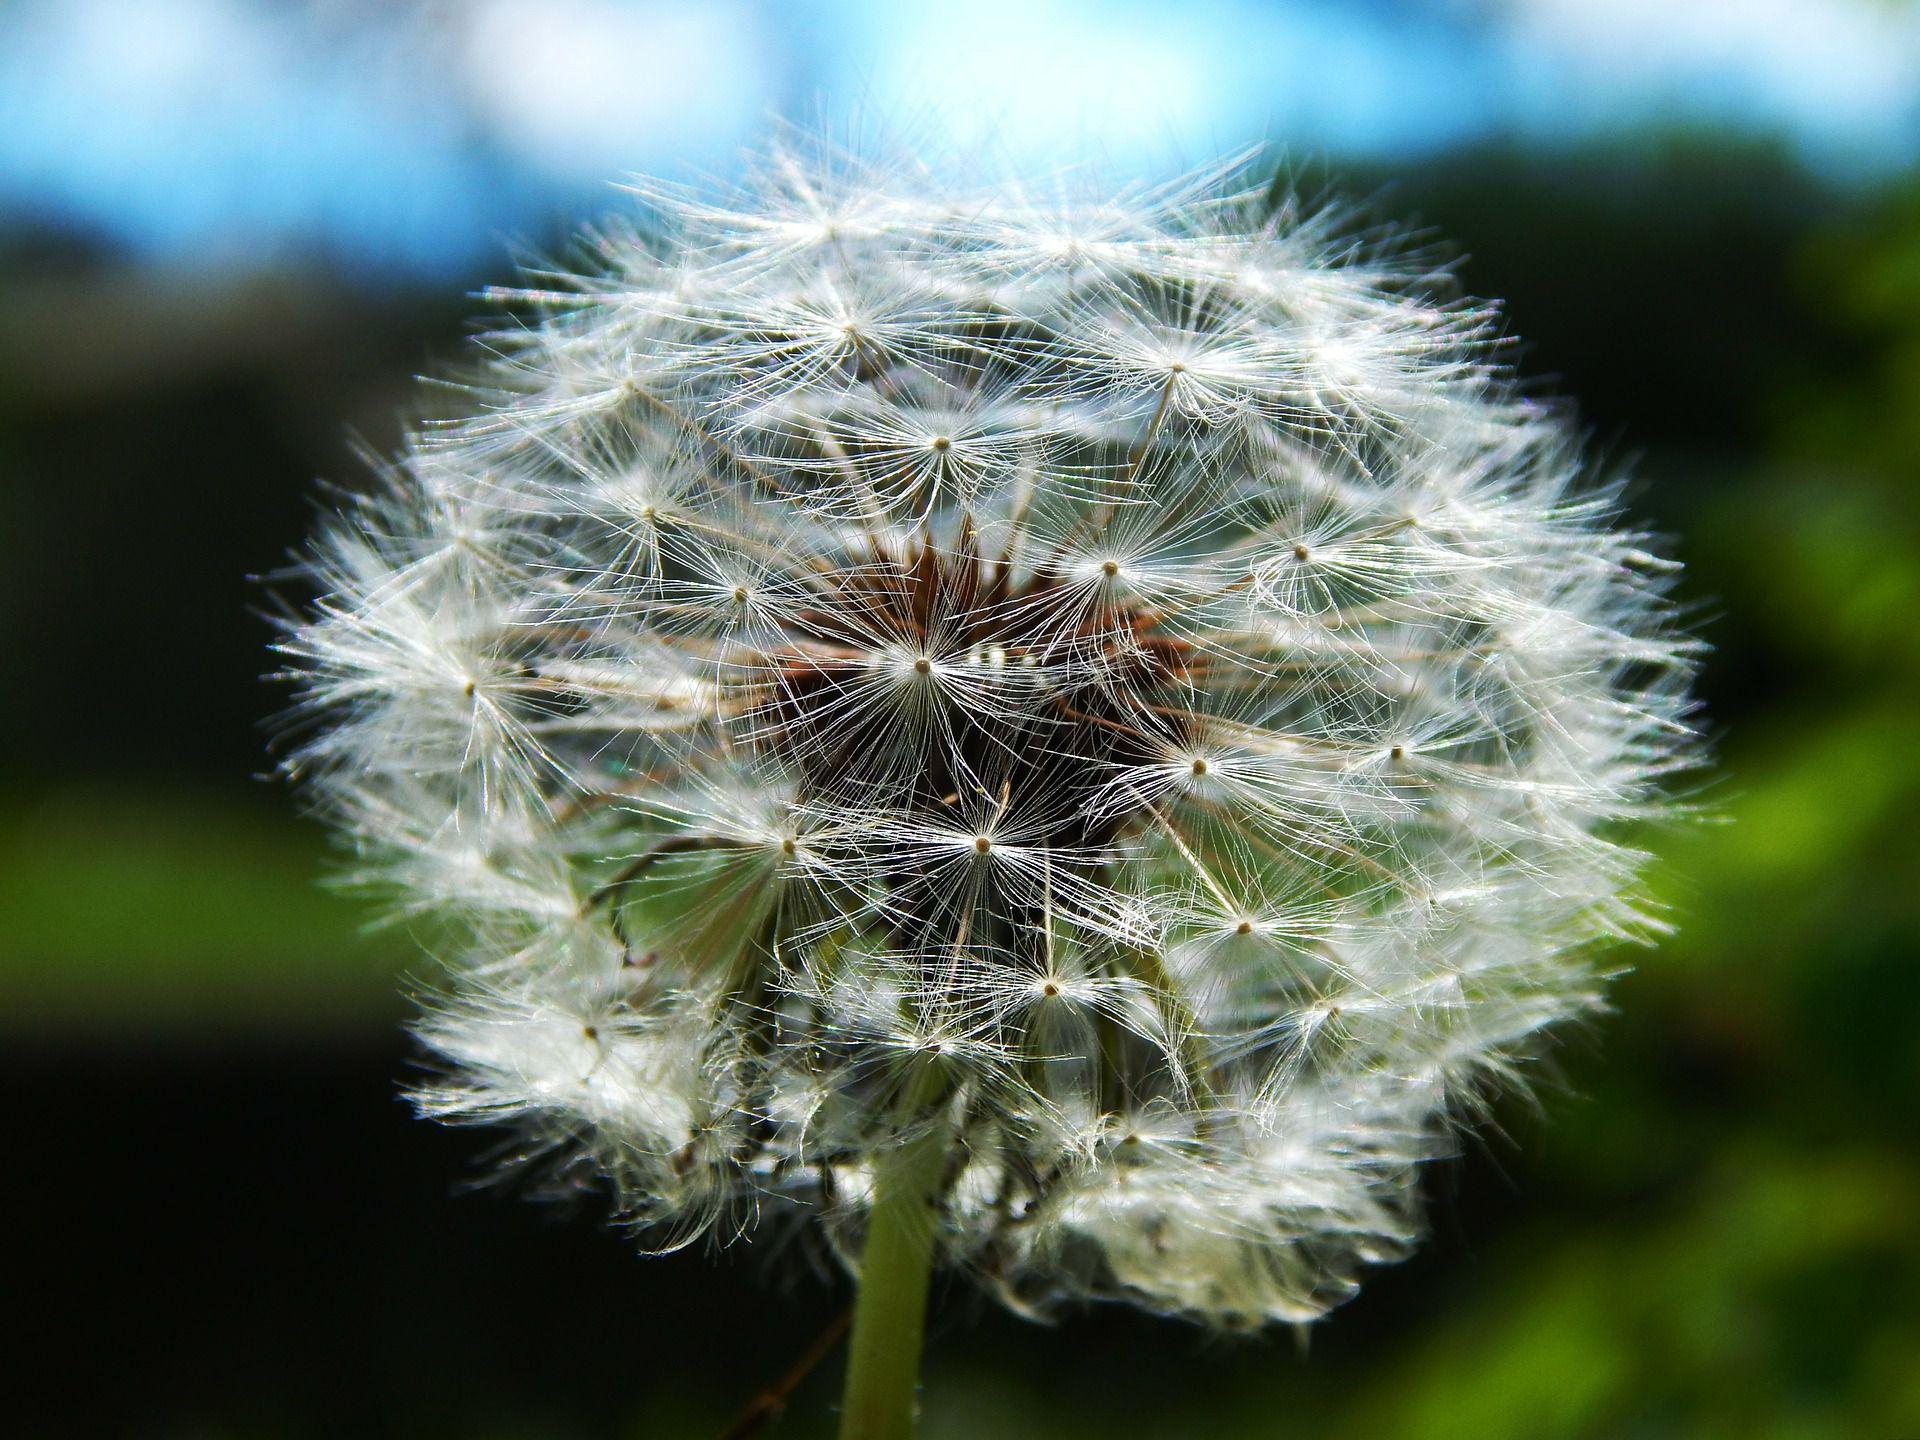 Photo gallery of common types of weeds izmirmasajfo